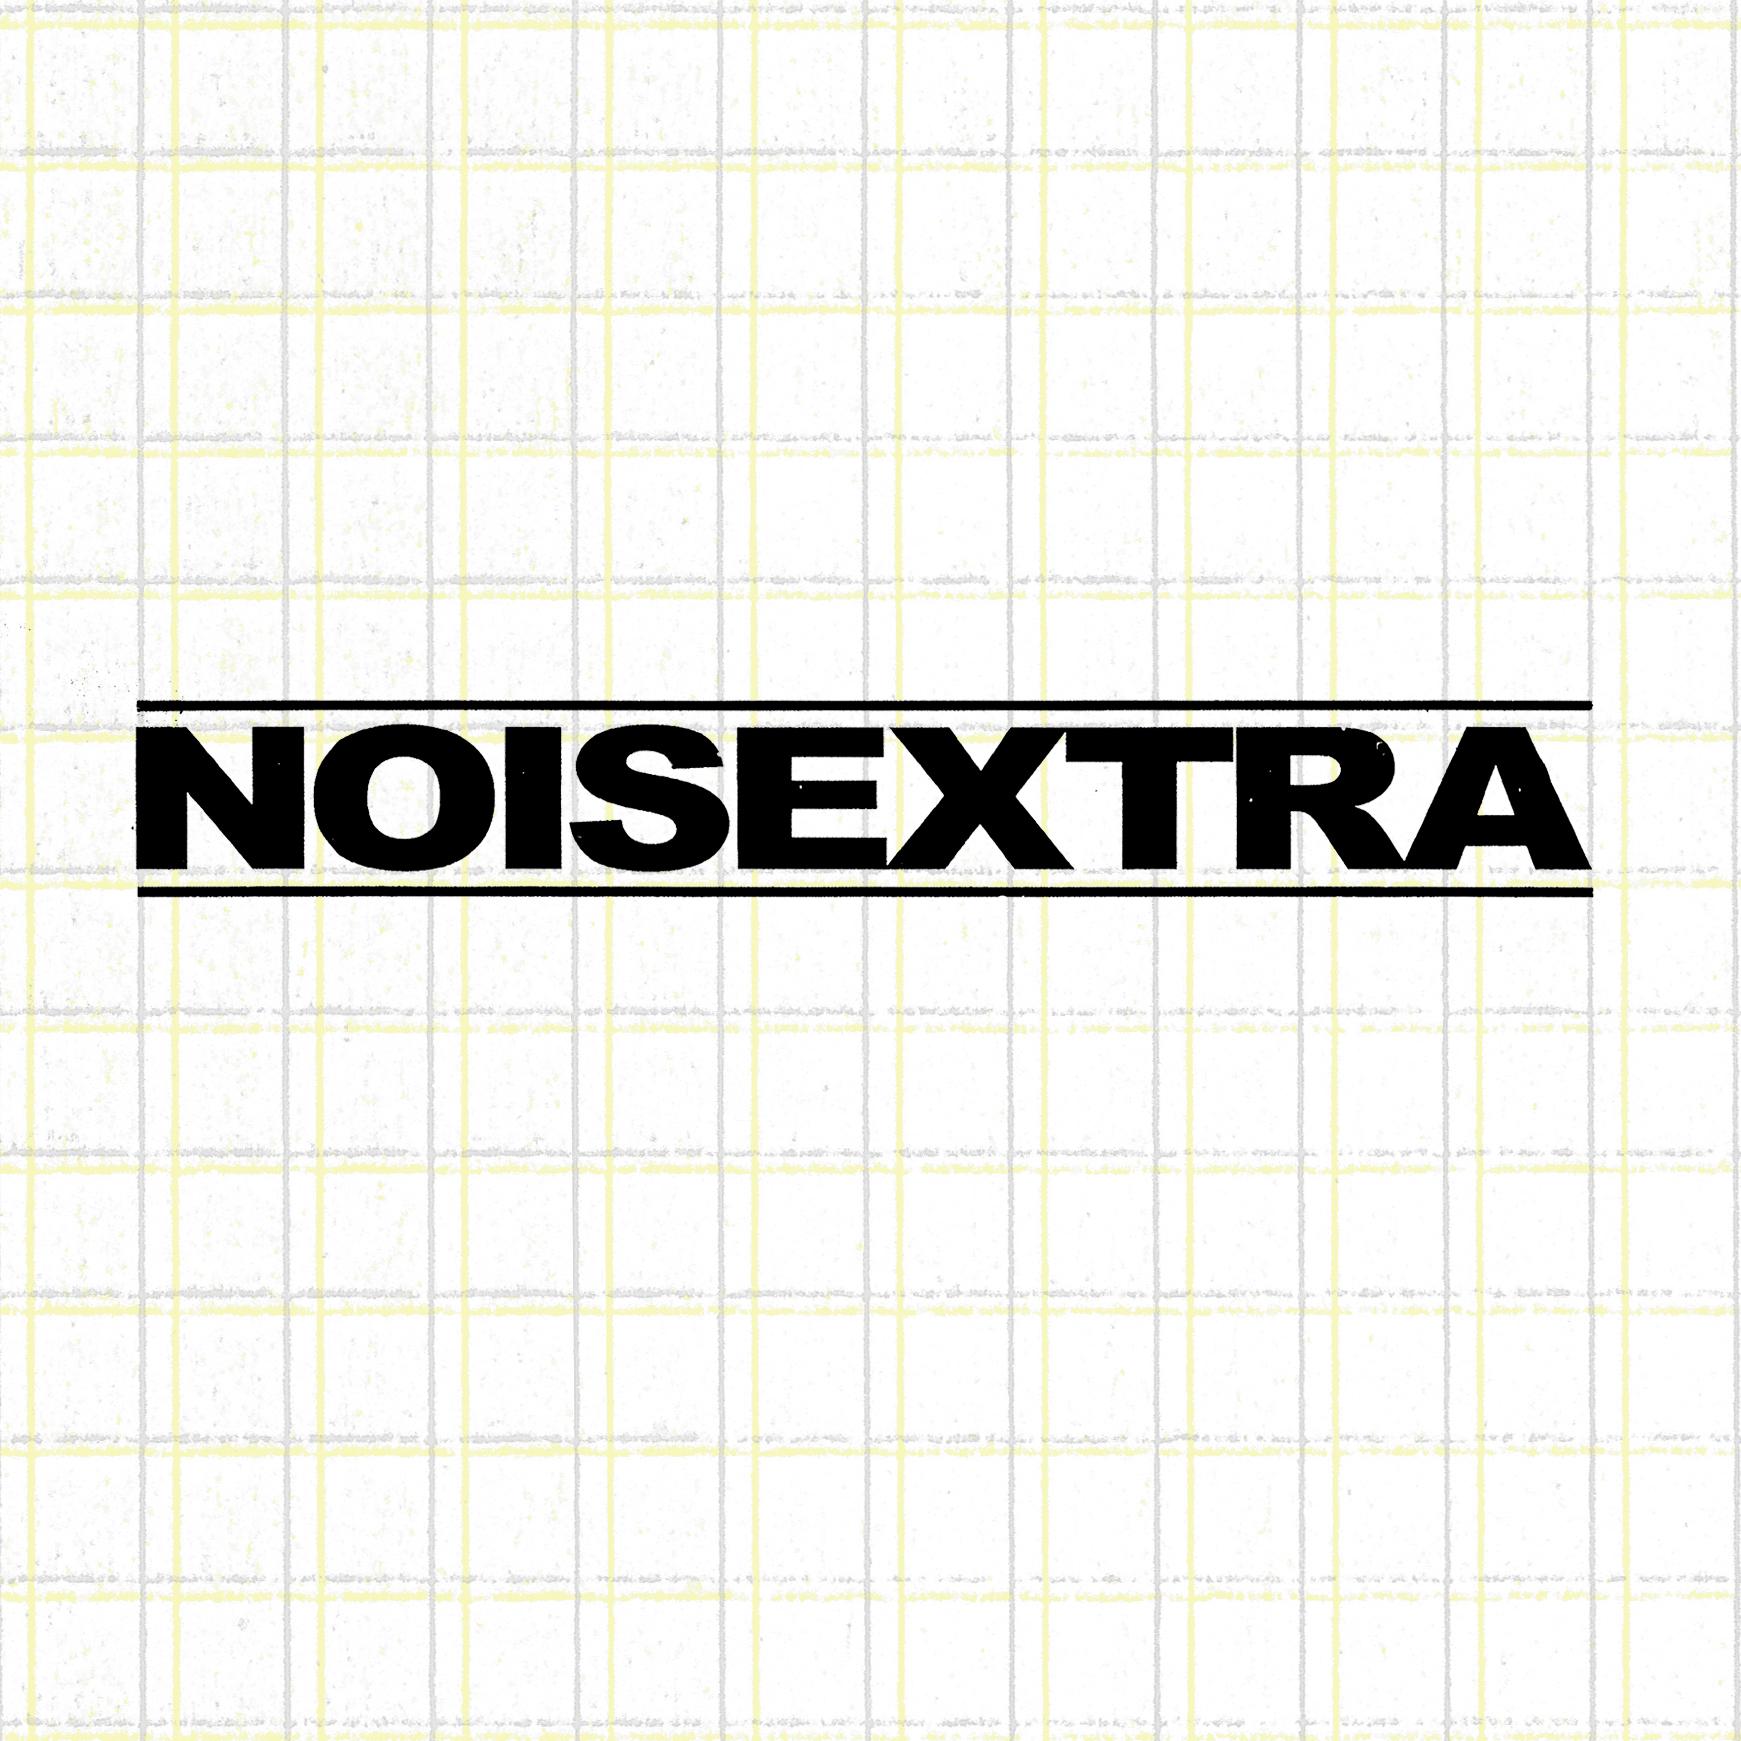 NOISEXTRA - The noise podcast.